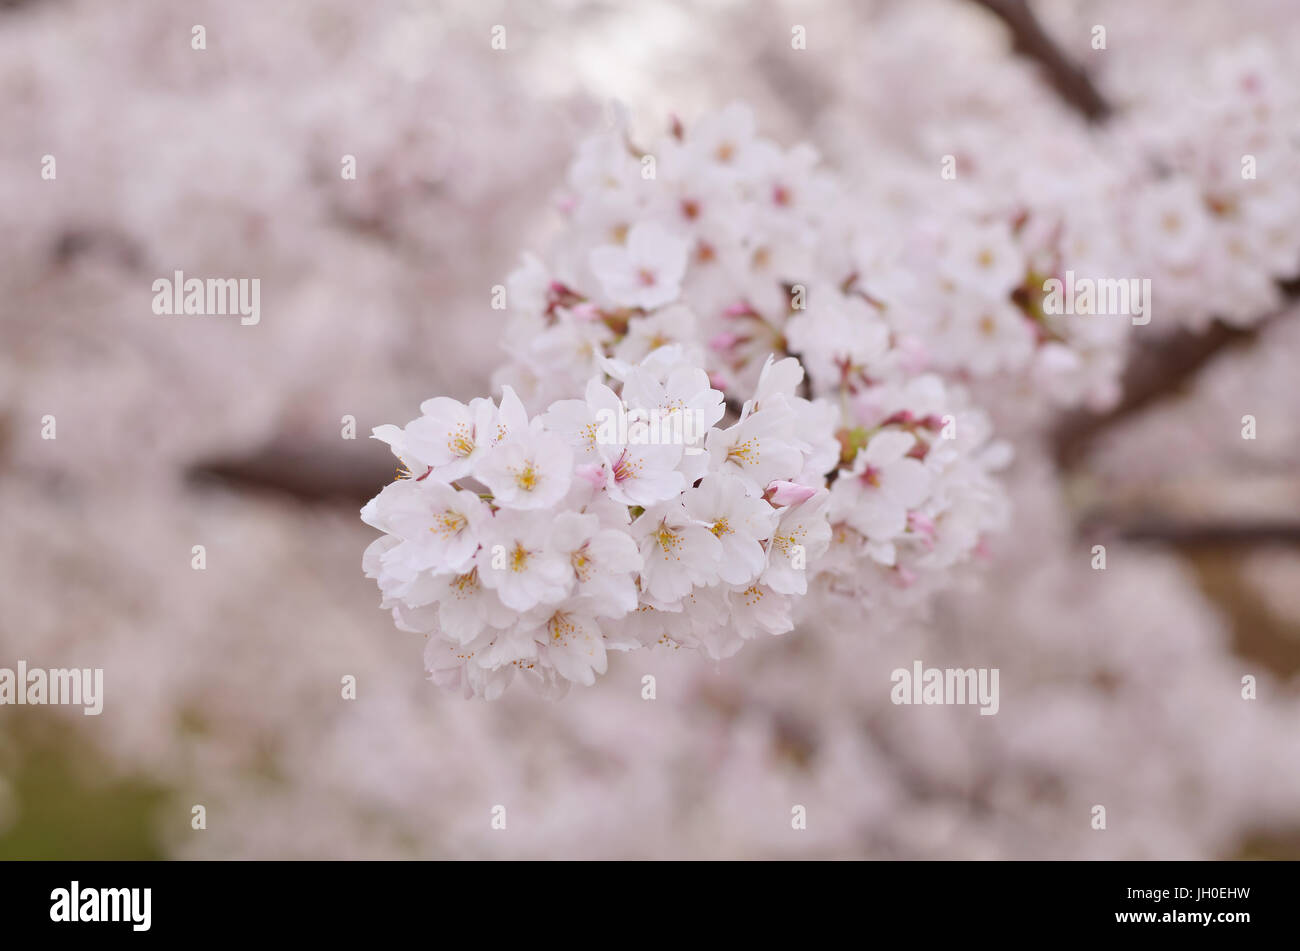 Cherry Blossom With Soft Focus Sakura Flowers In Japan Stock Photo